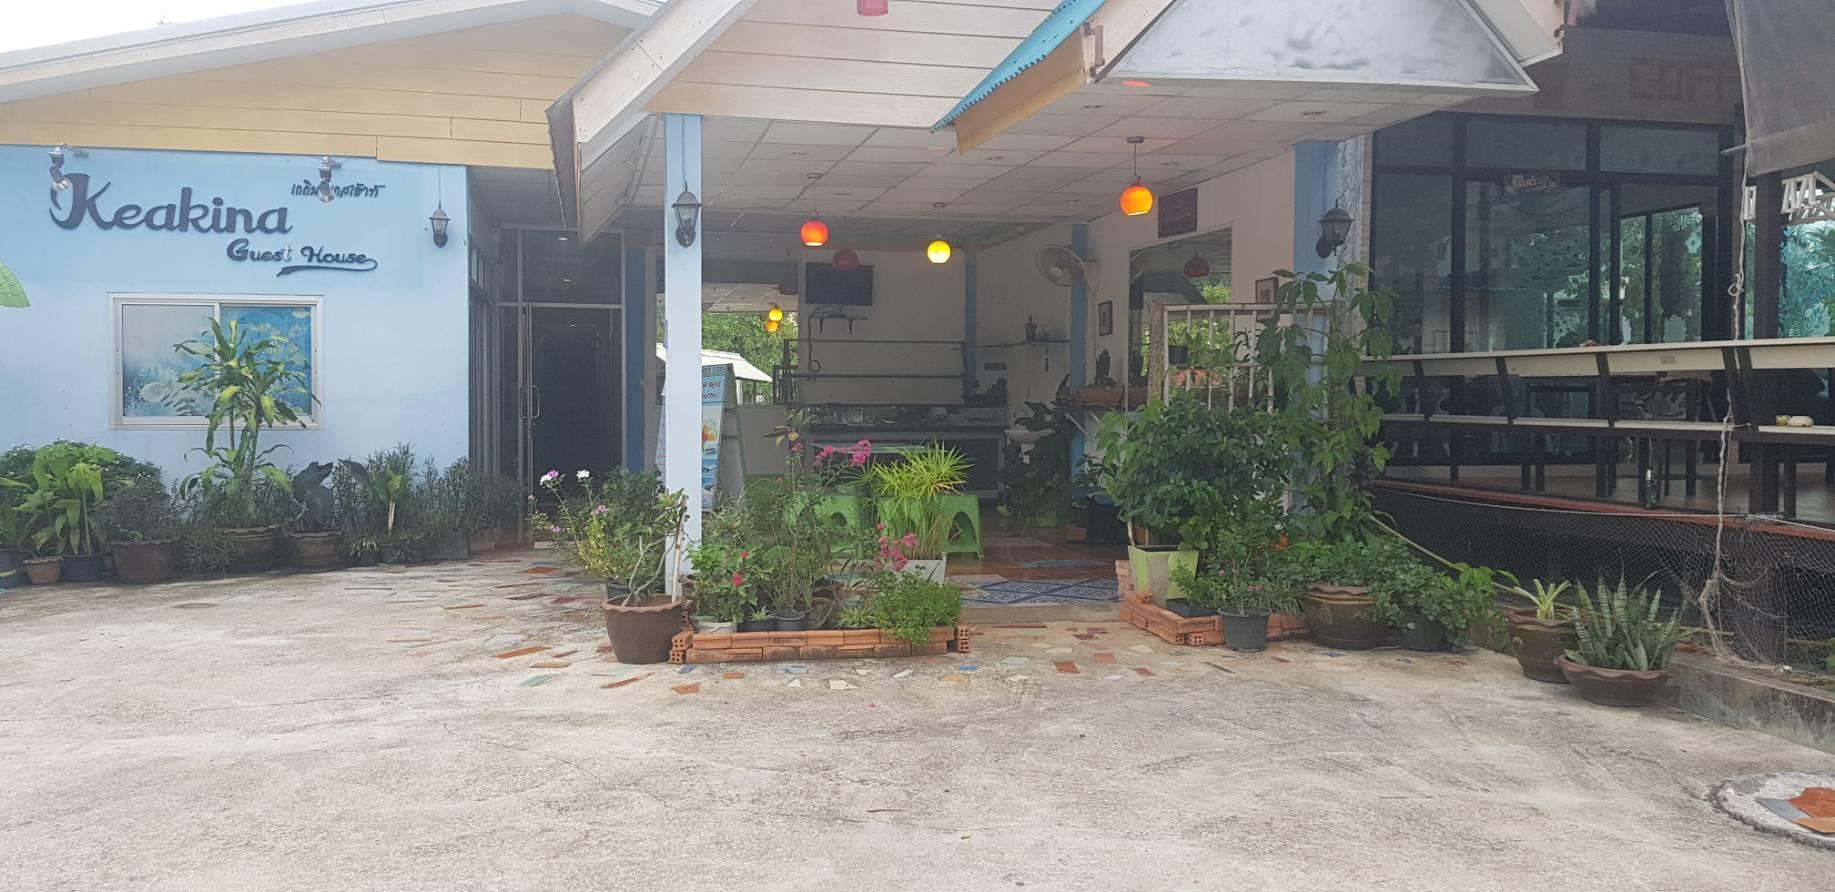 Keakina Guest House